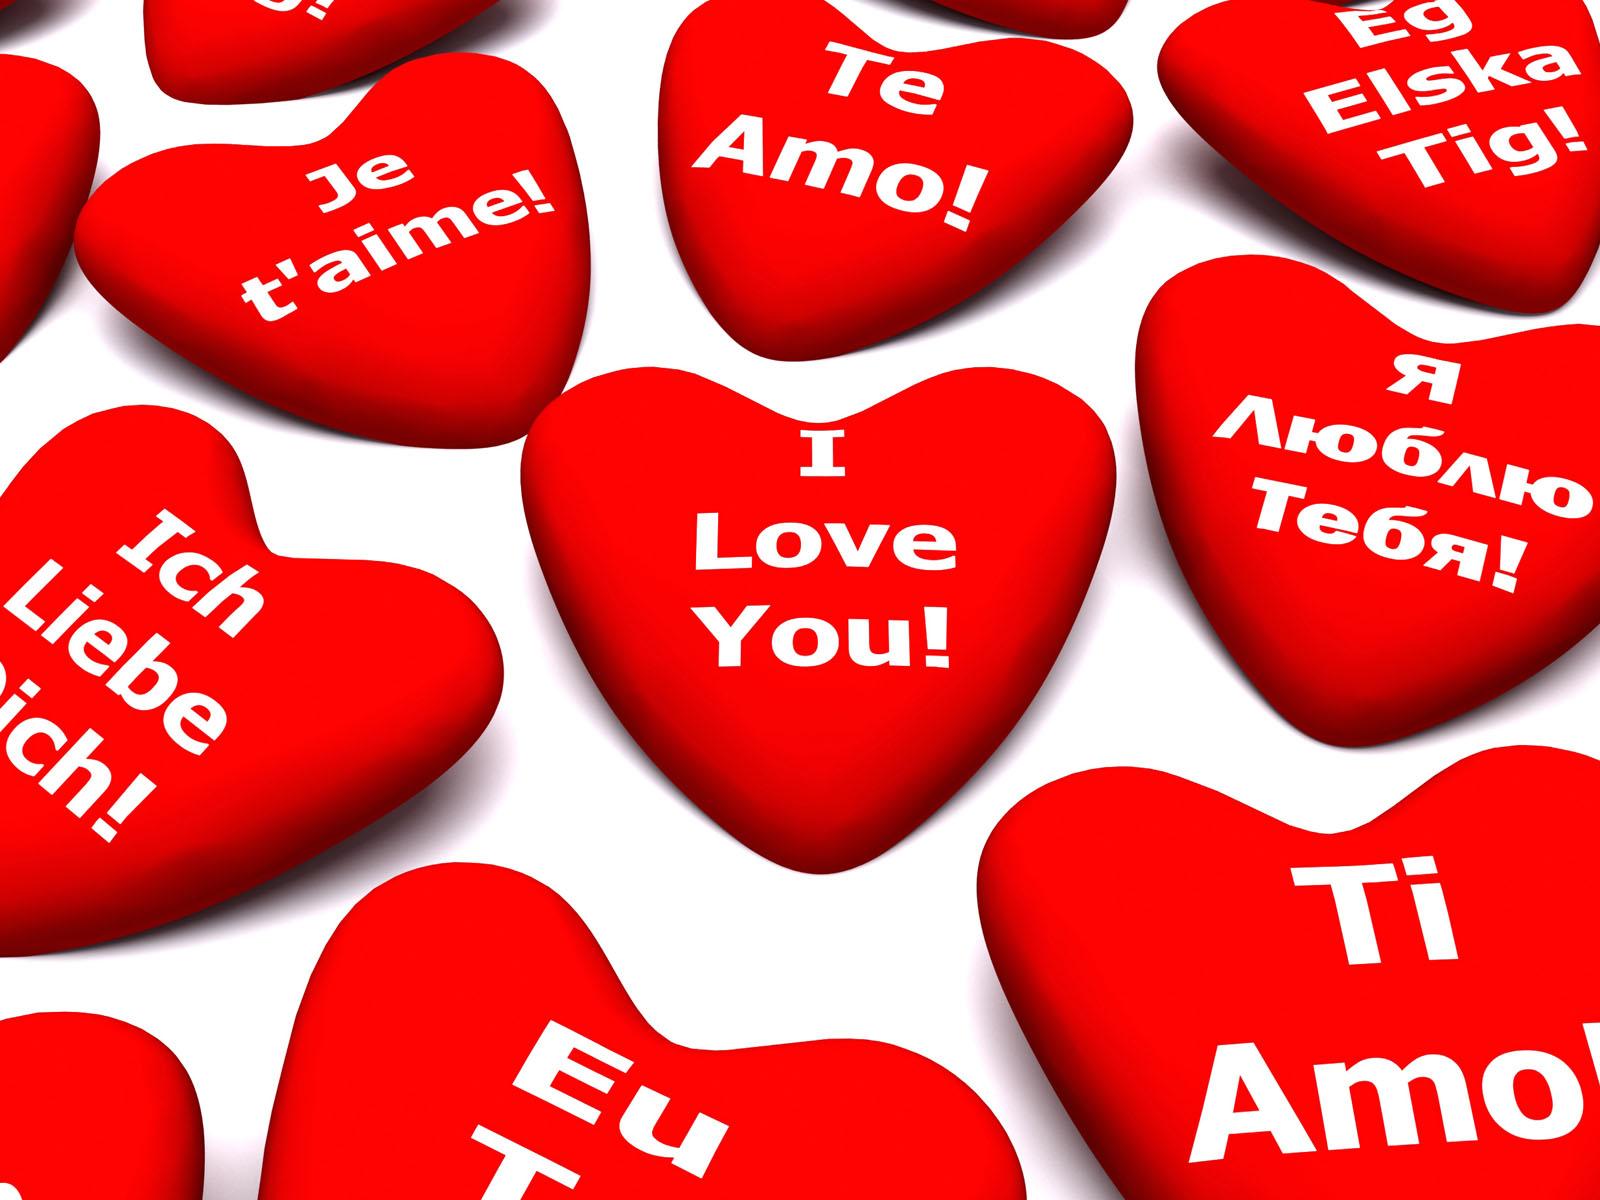 Сердце любимому картинки с надписями на английскому, стишки